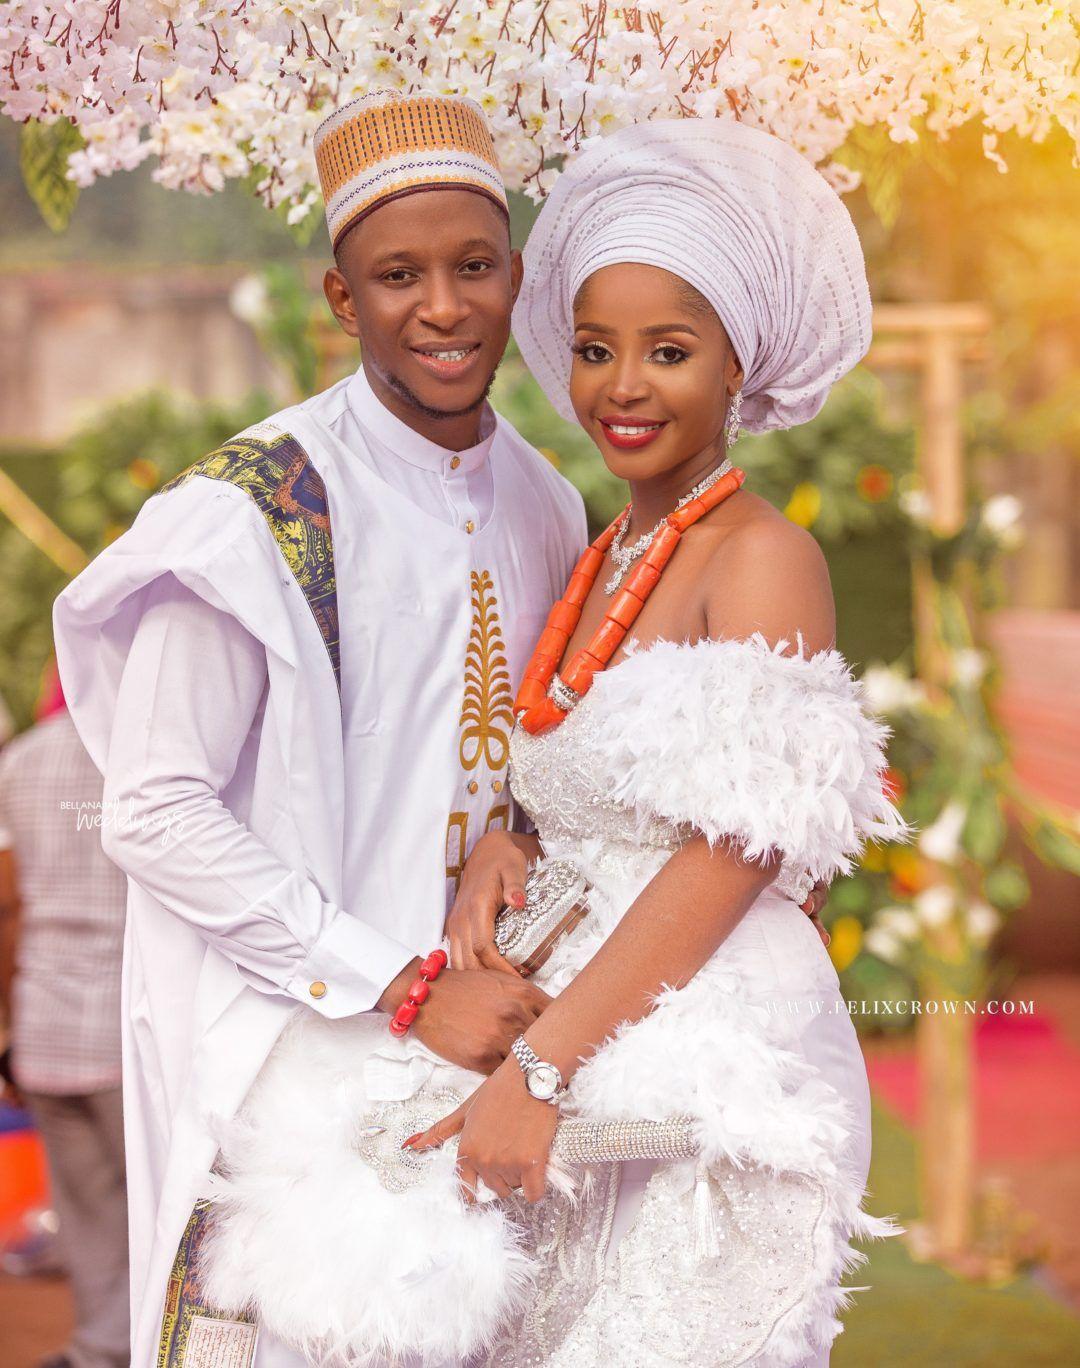 Traditionalwedding Traditional Wedding In 2020 Modern Wedding Ceremony Wedding Ceremony Traditions Wedding Modern